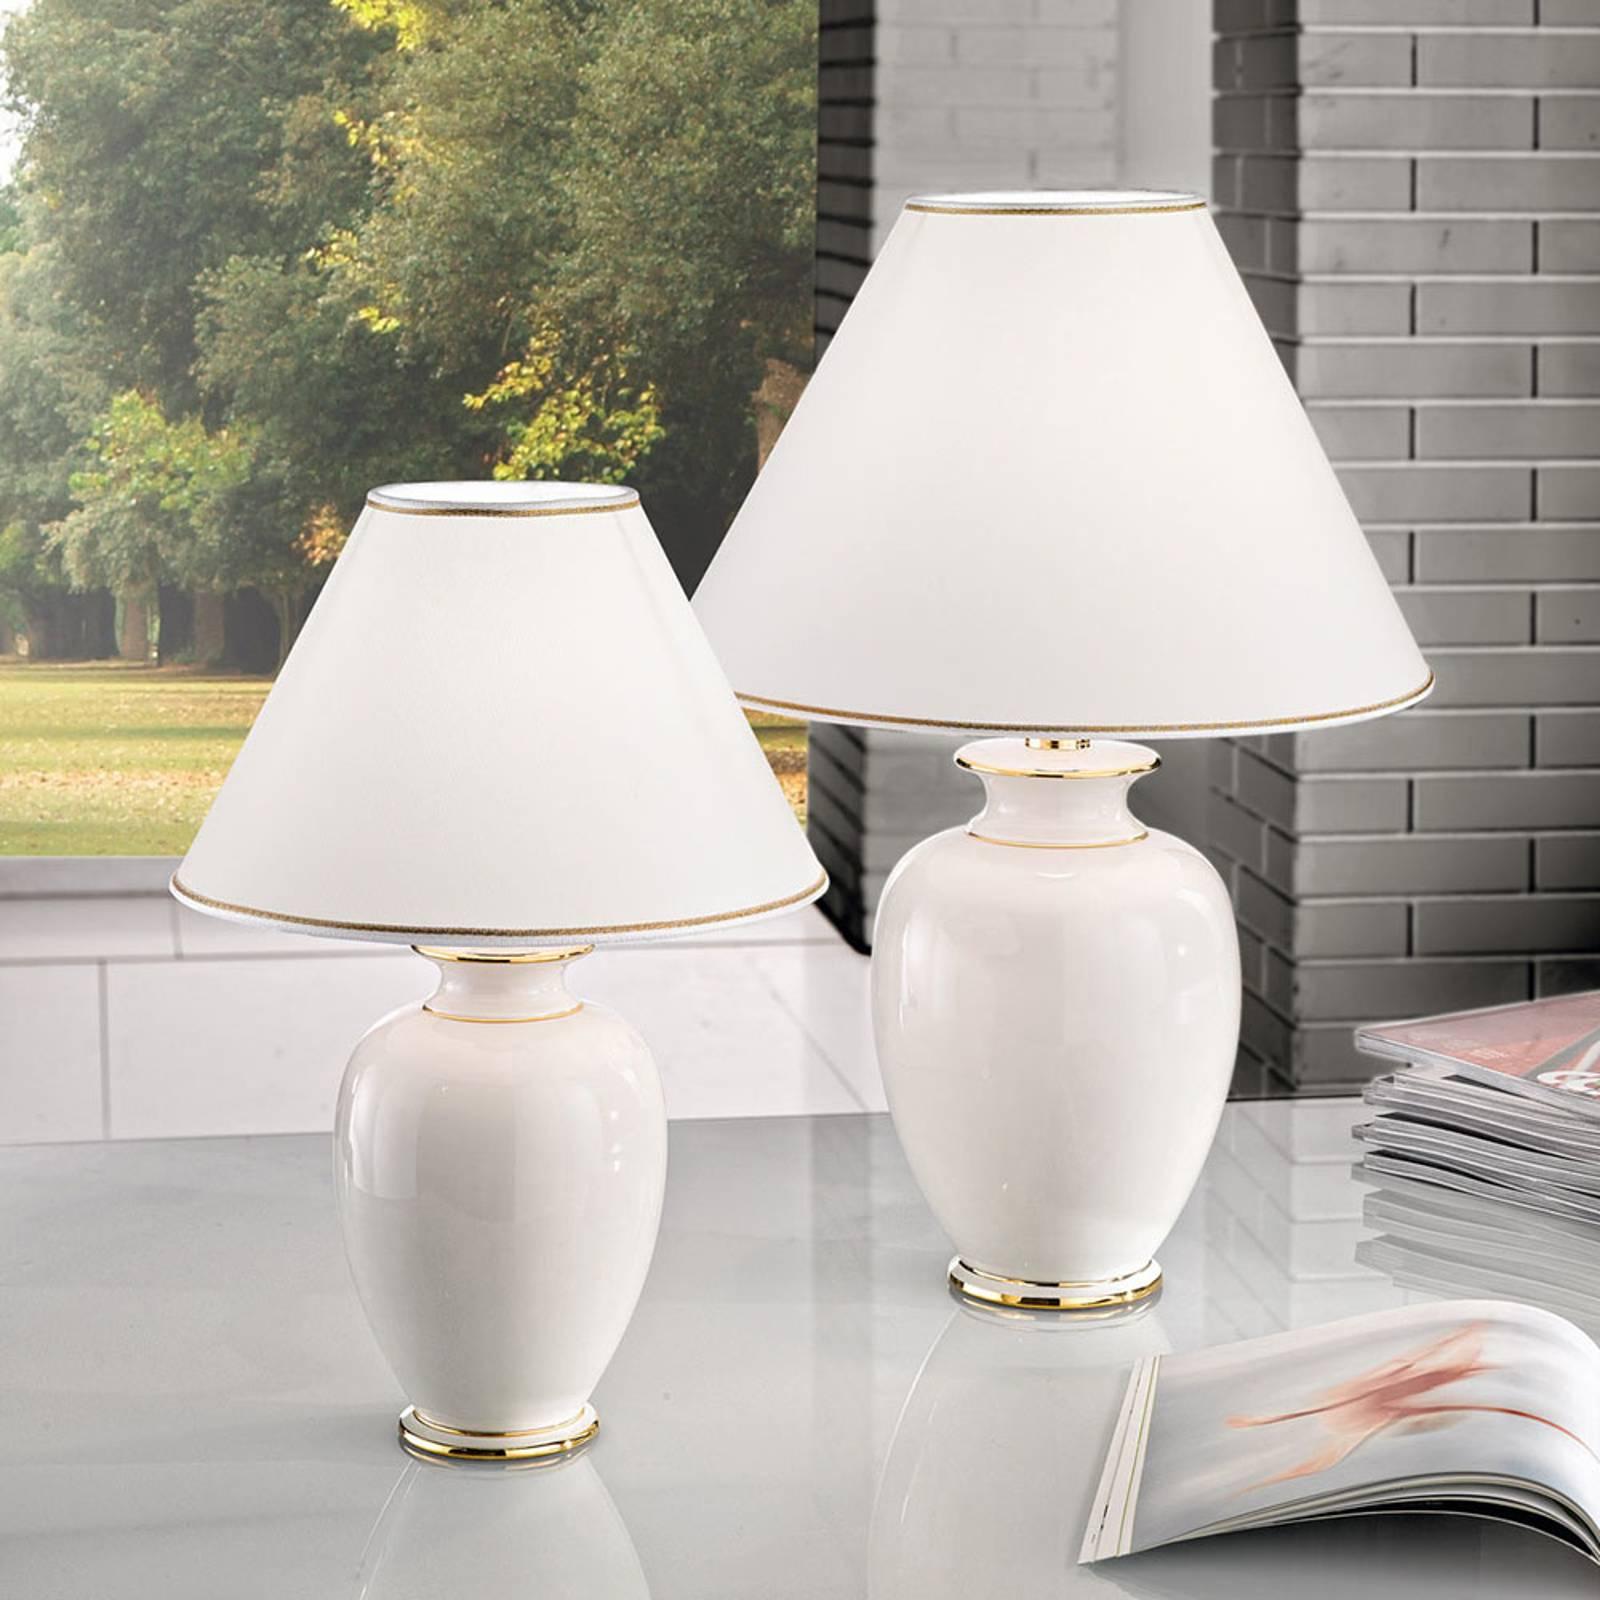 Tafellamp Giardino Avorio in wit-goud, Ø 40 cm